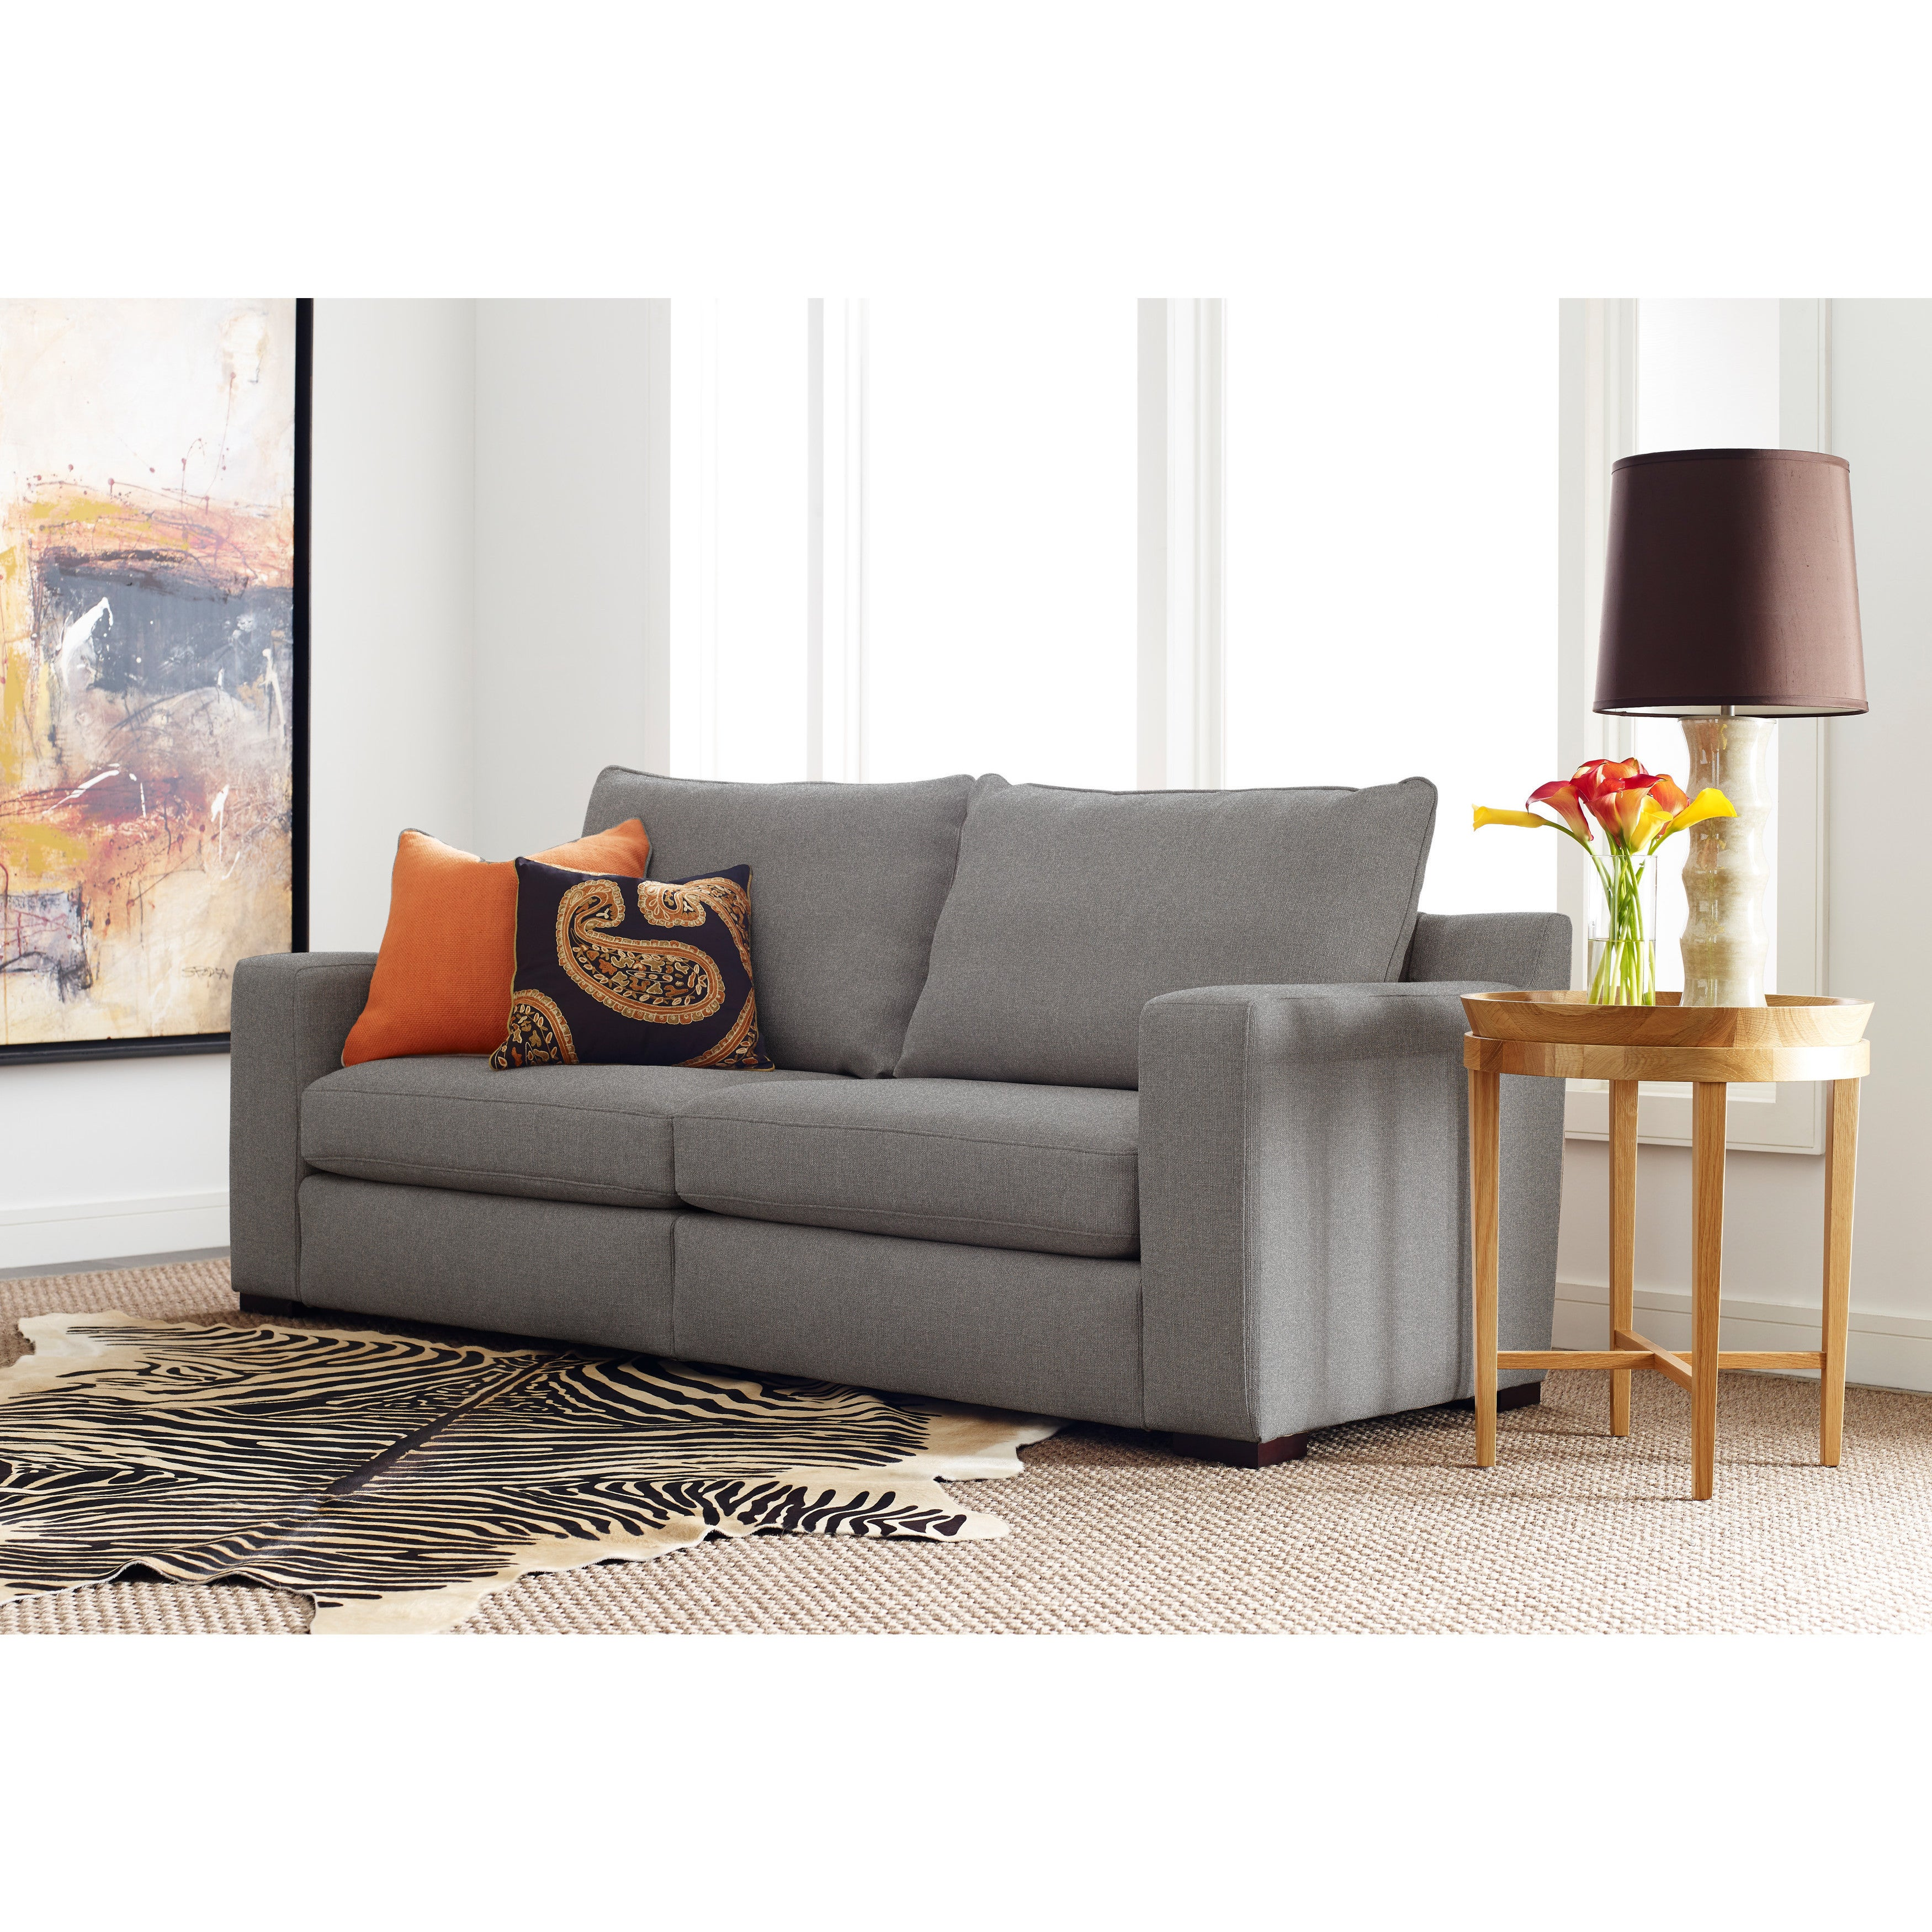 Serta Deep Seating Geneva 85 Inch Grey Sofa